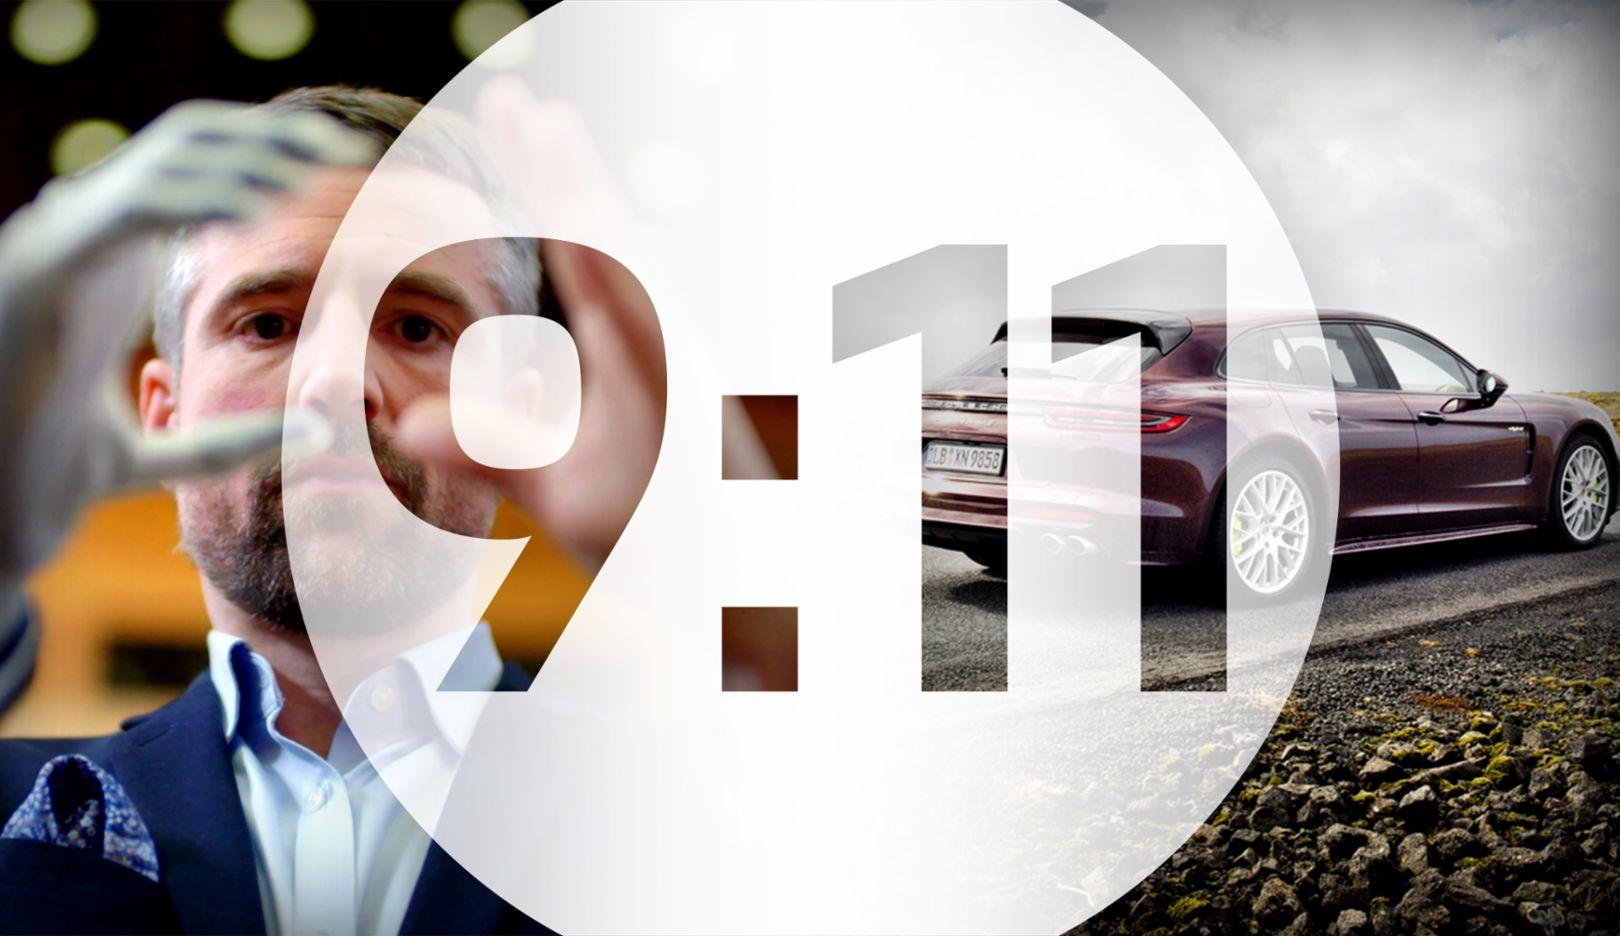 Panamera Turbo S E-Hybrid Sport Turismo, Iceland, 2017, Porsche AG